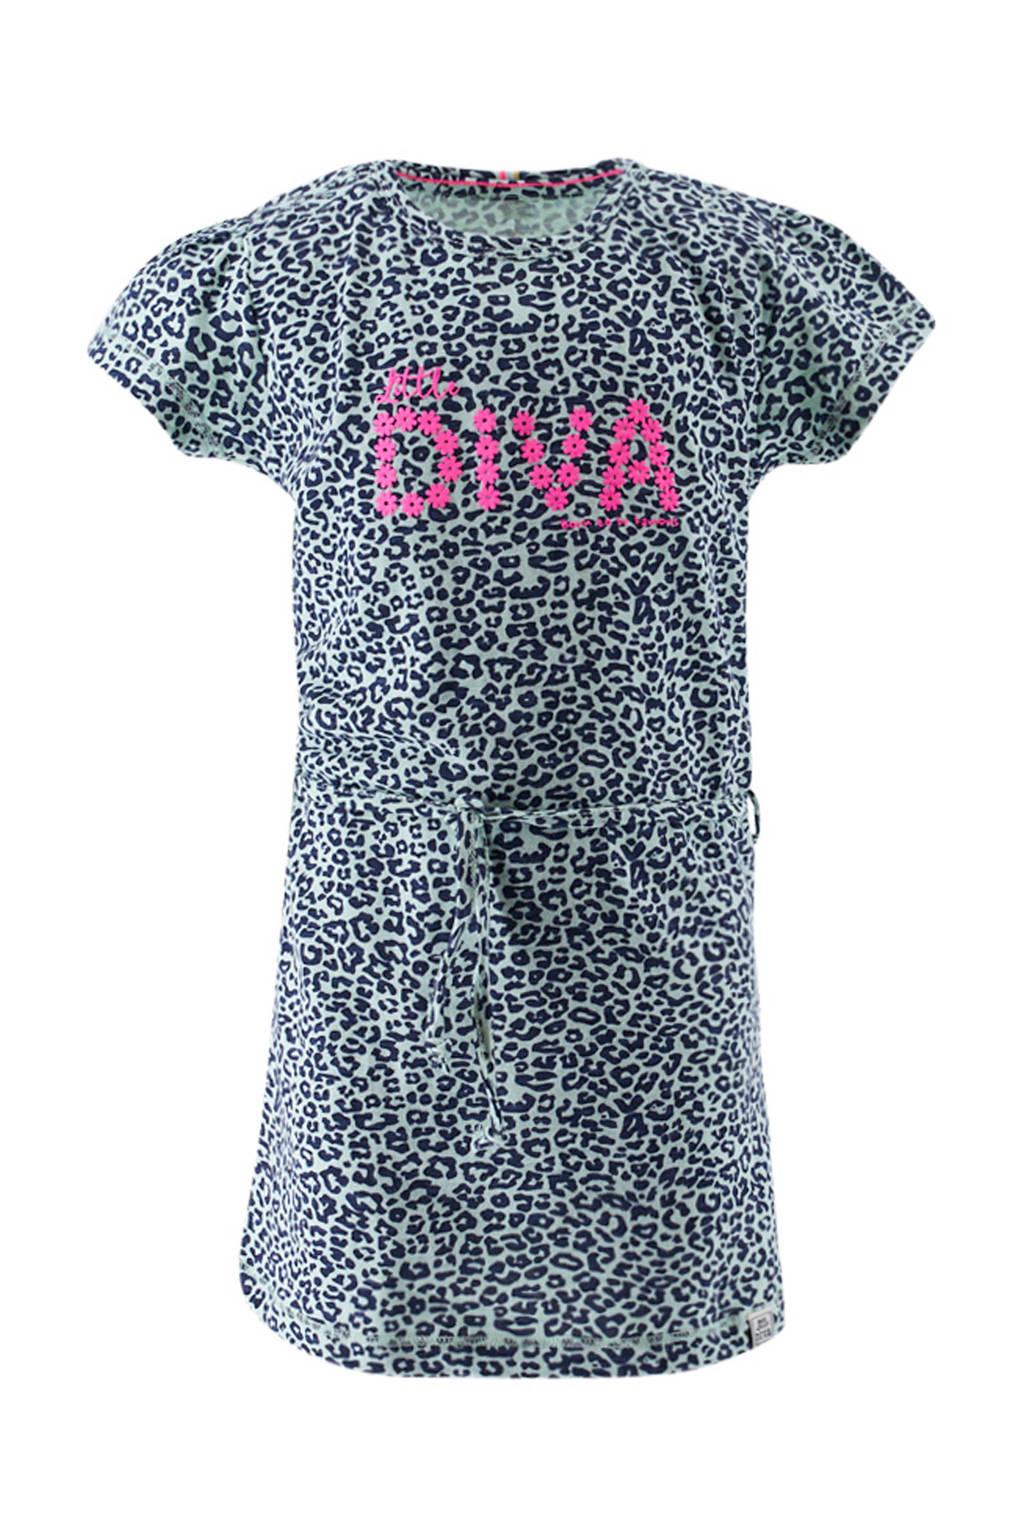 born to be famous. jersey jurk met panterprint en ceintuur mintgroen/donkerblauw/roze, Mintgroen/donkerblauw/roze